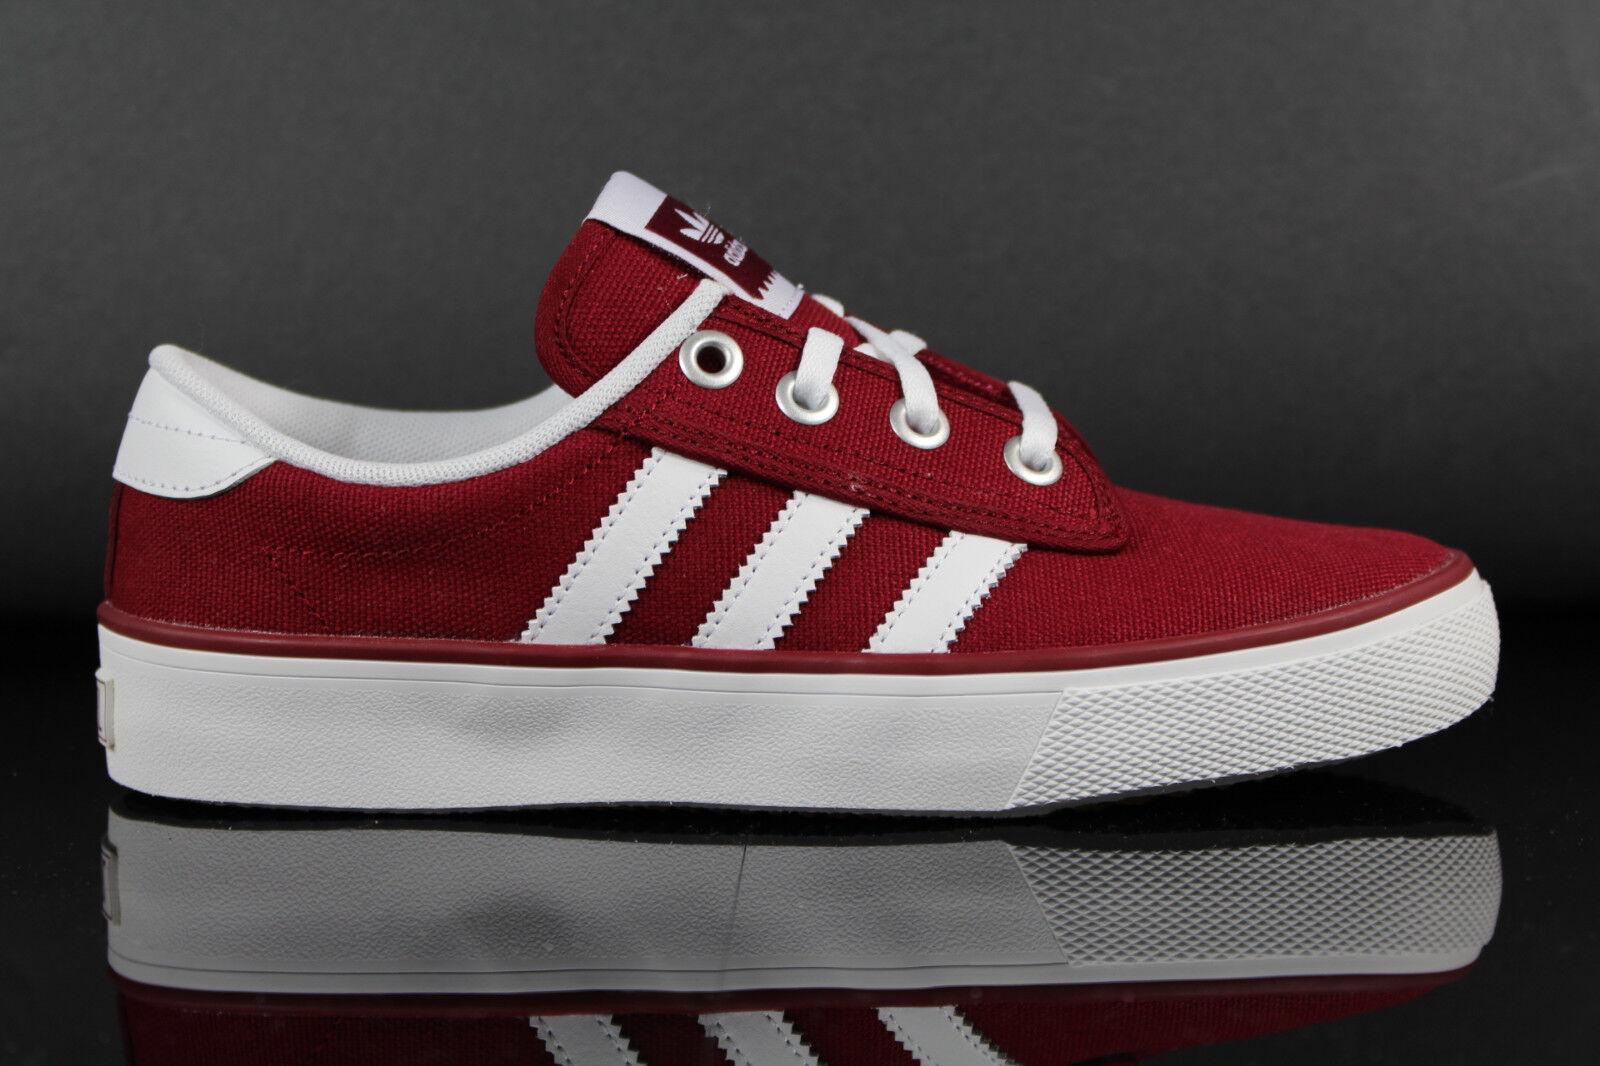 Neu Adidas Unisex Sportschuhe Schuhe Kiel - Sneaker - Schuhe Sportschuhe - Turnschuhe - F37407 - 5640b8